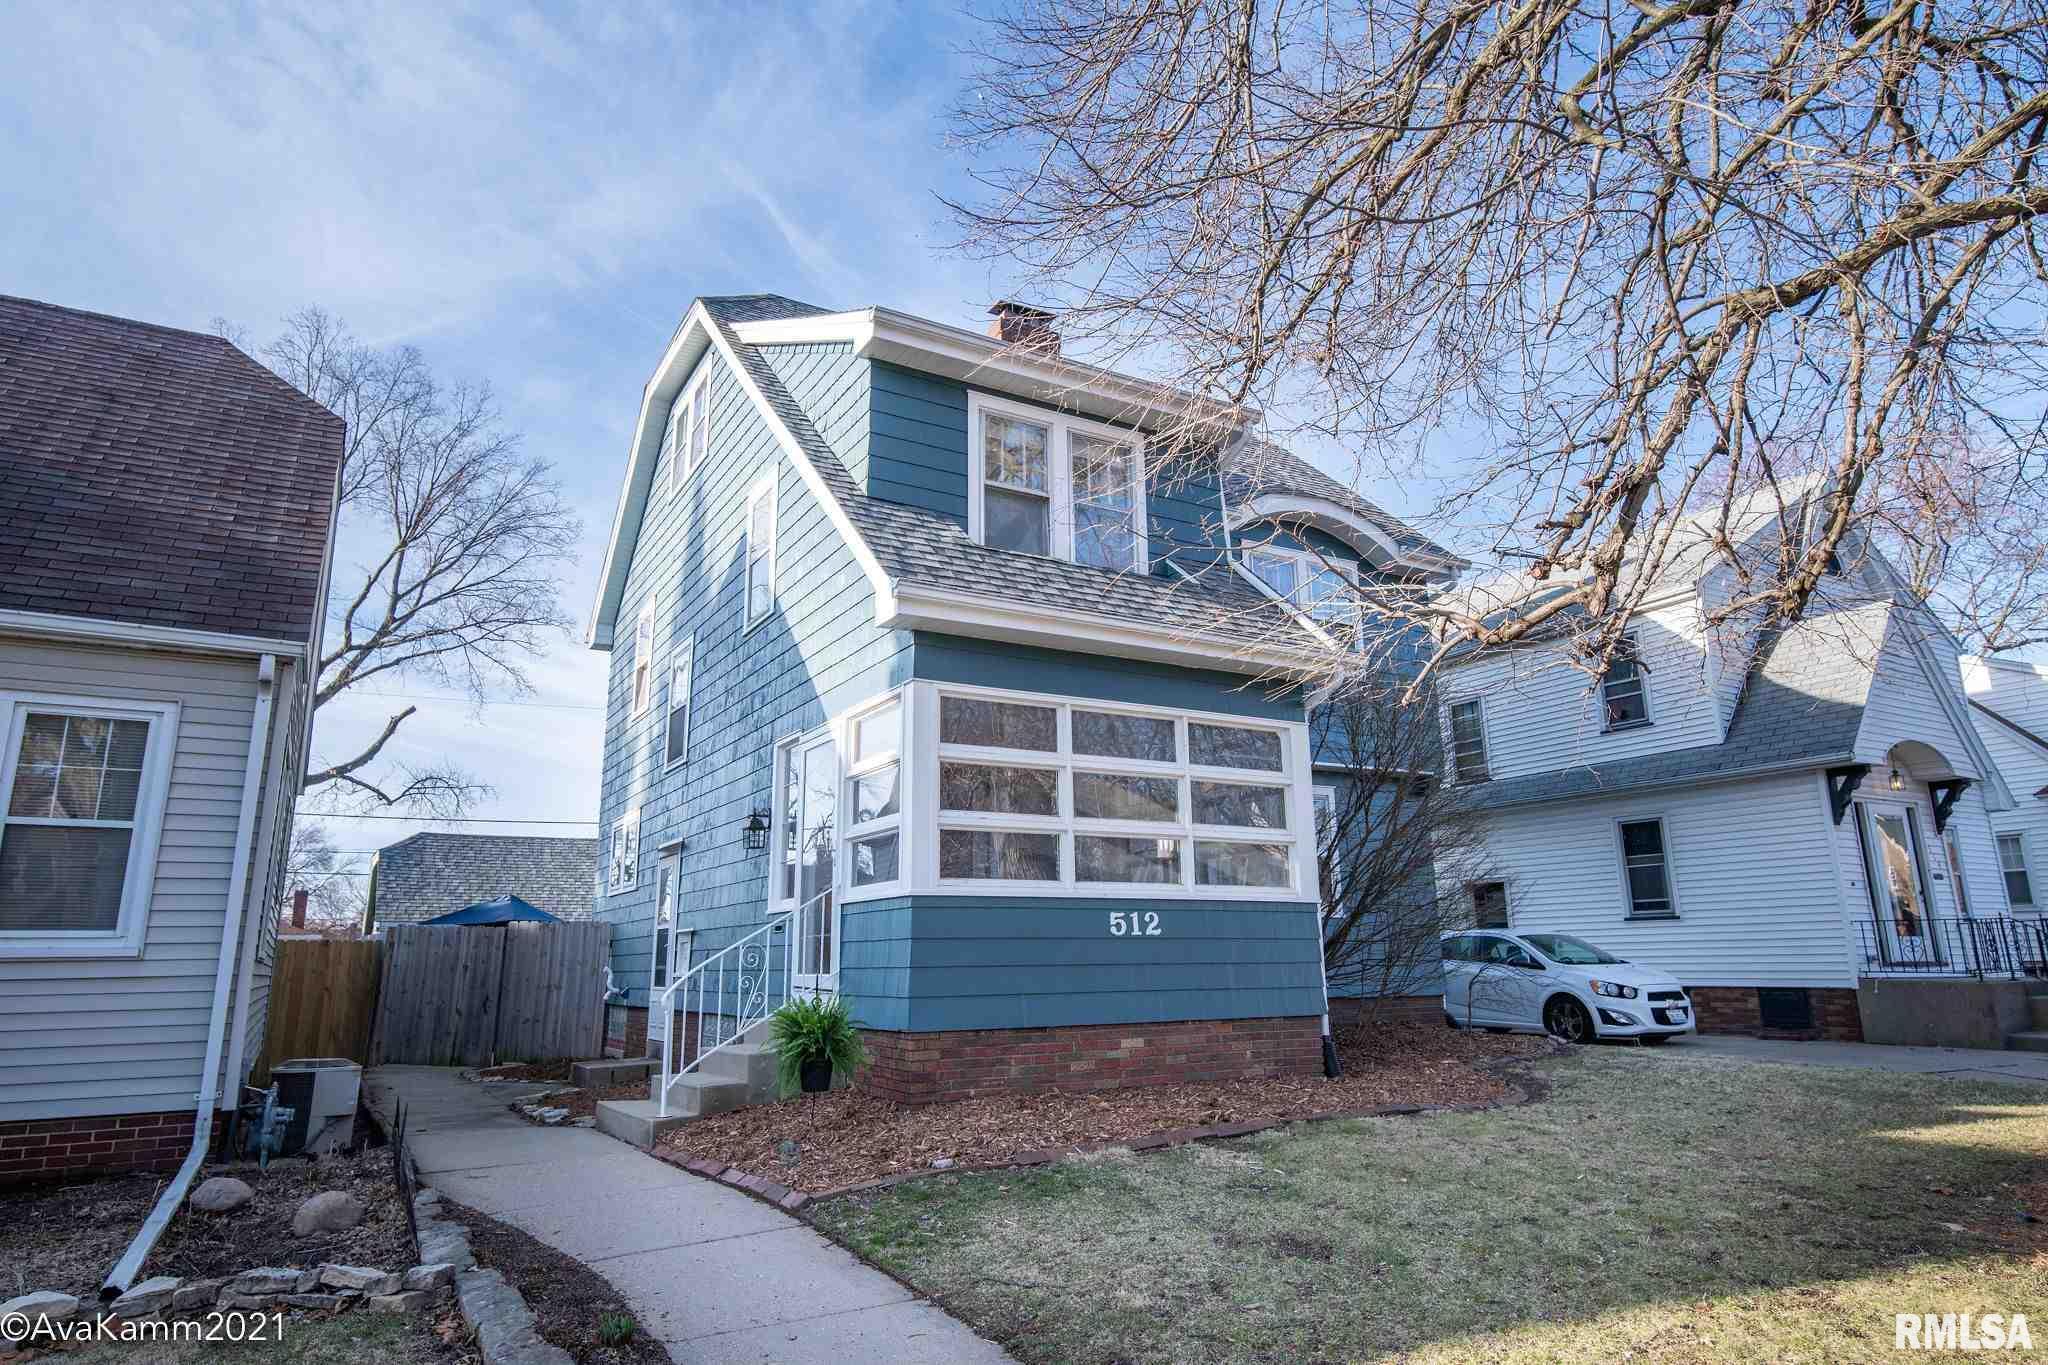 512 W MAYWOOD Property Photo - Peoria, IL real estate listing